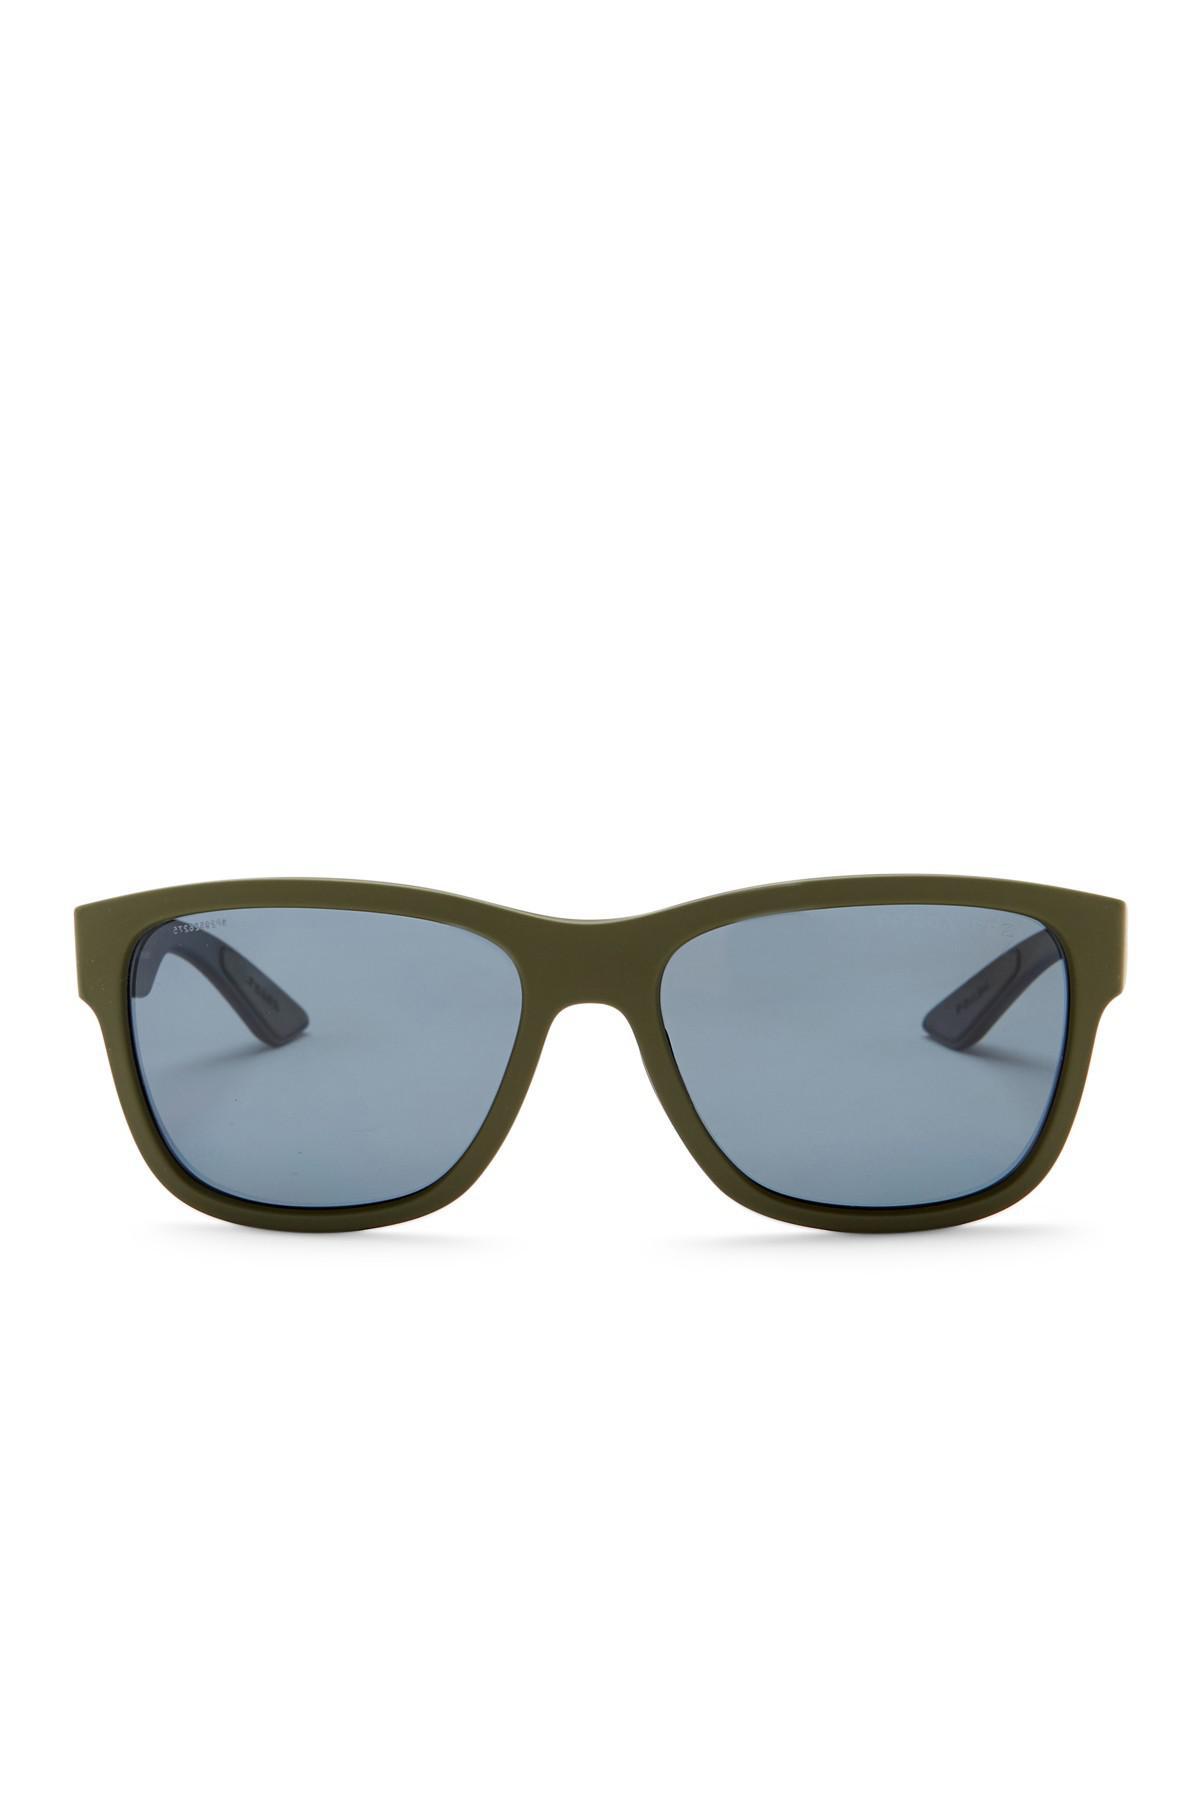 Lyst - Prada Men\'s Active Wayfarer Propionate Frame Sunglasses in ...